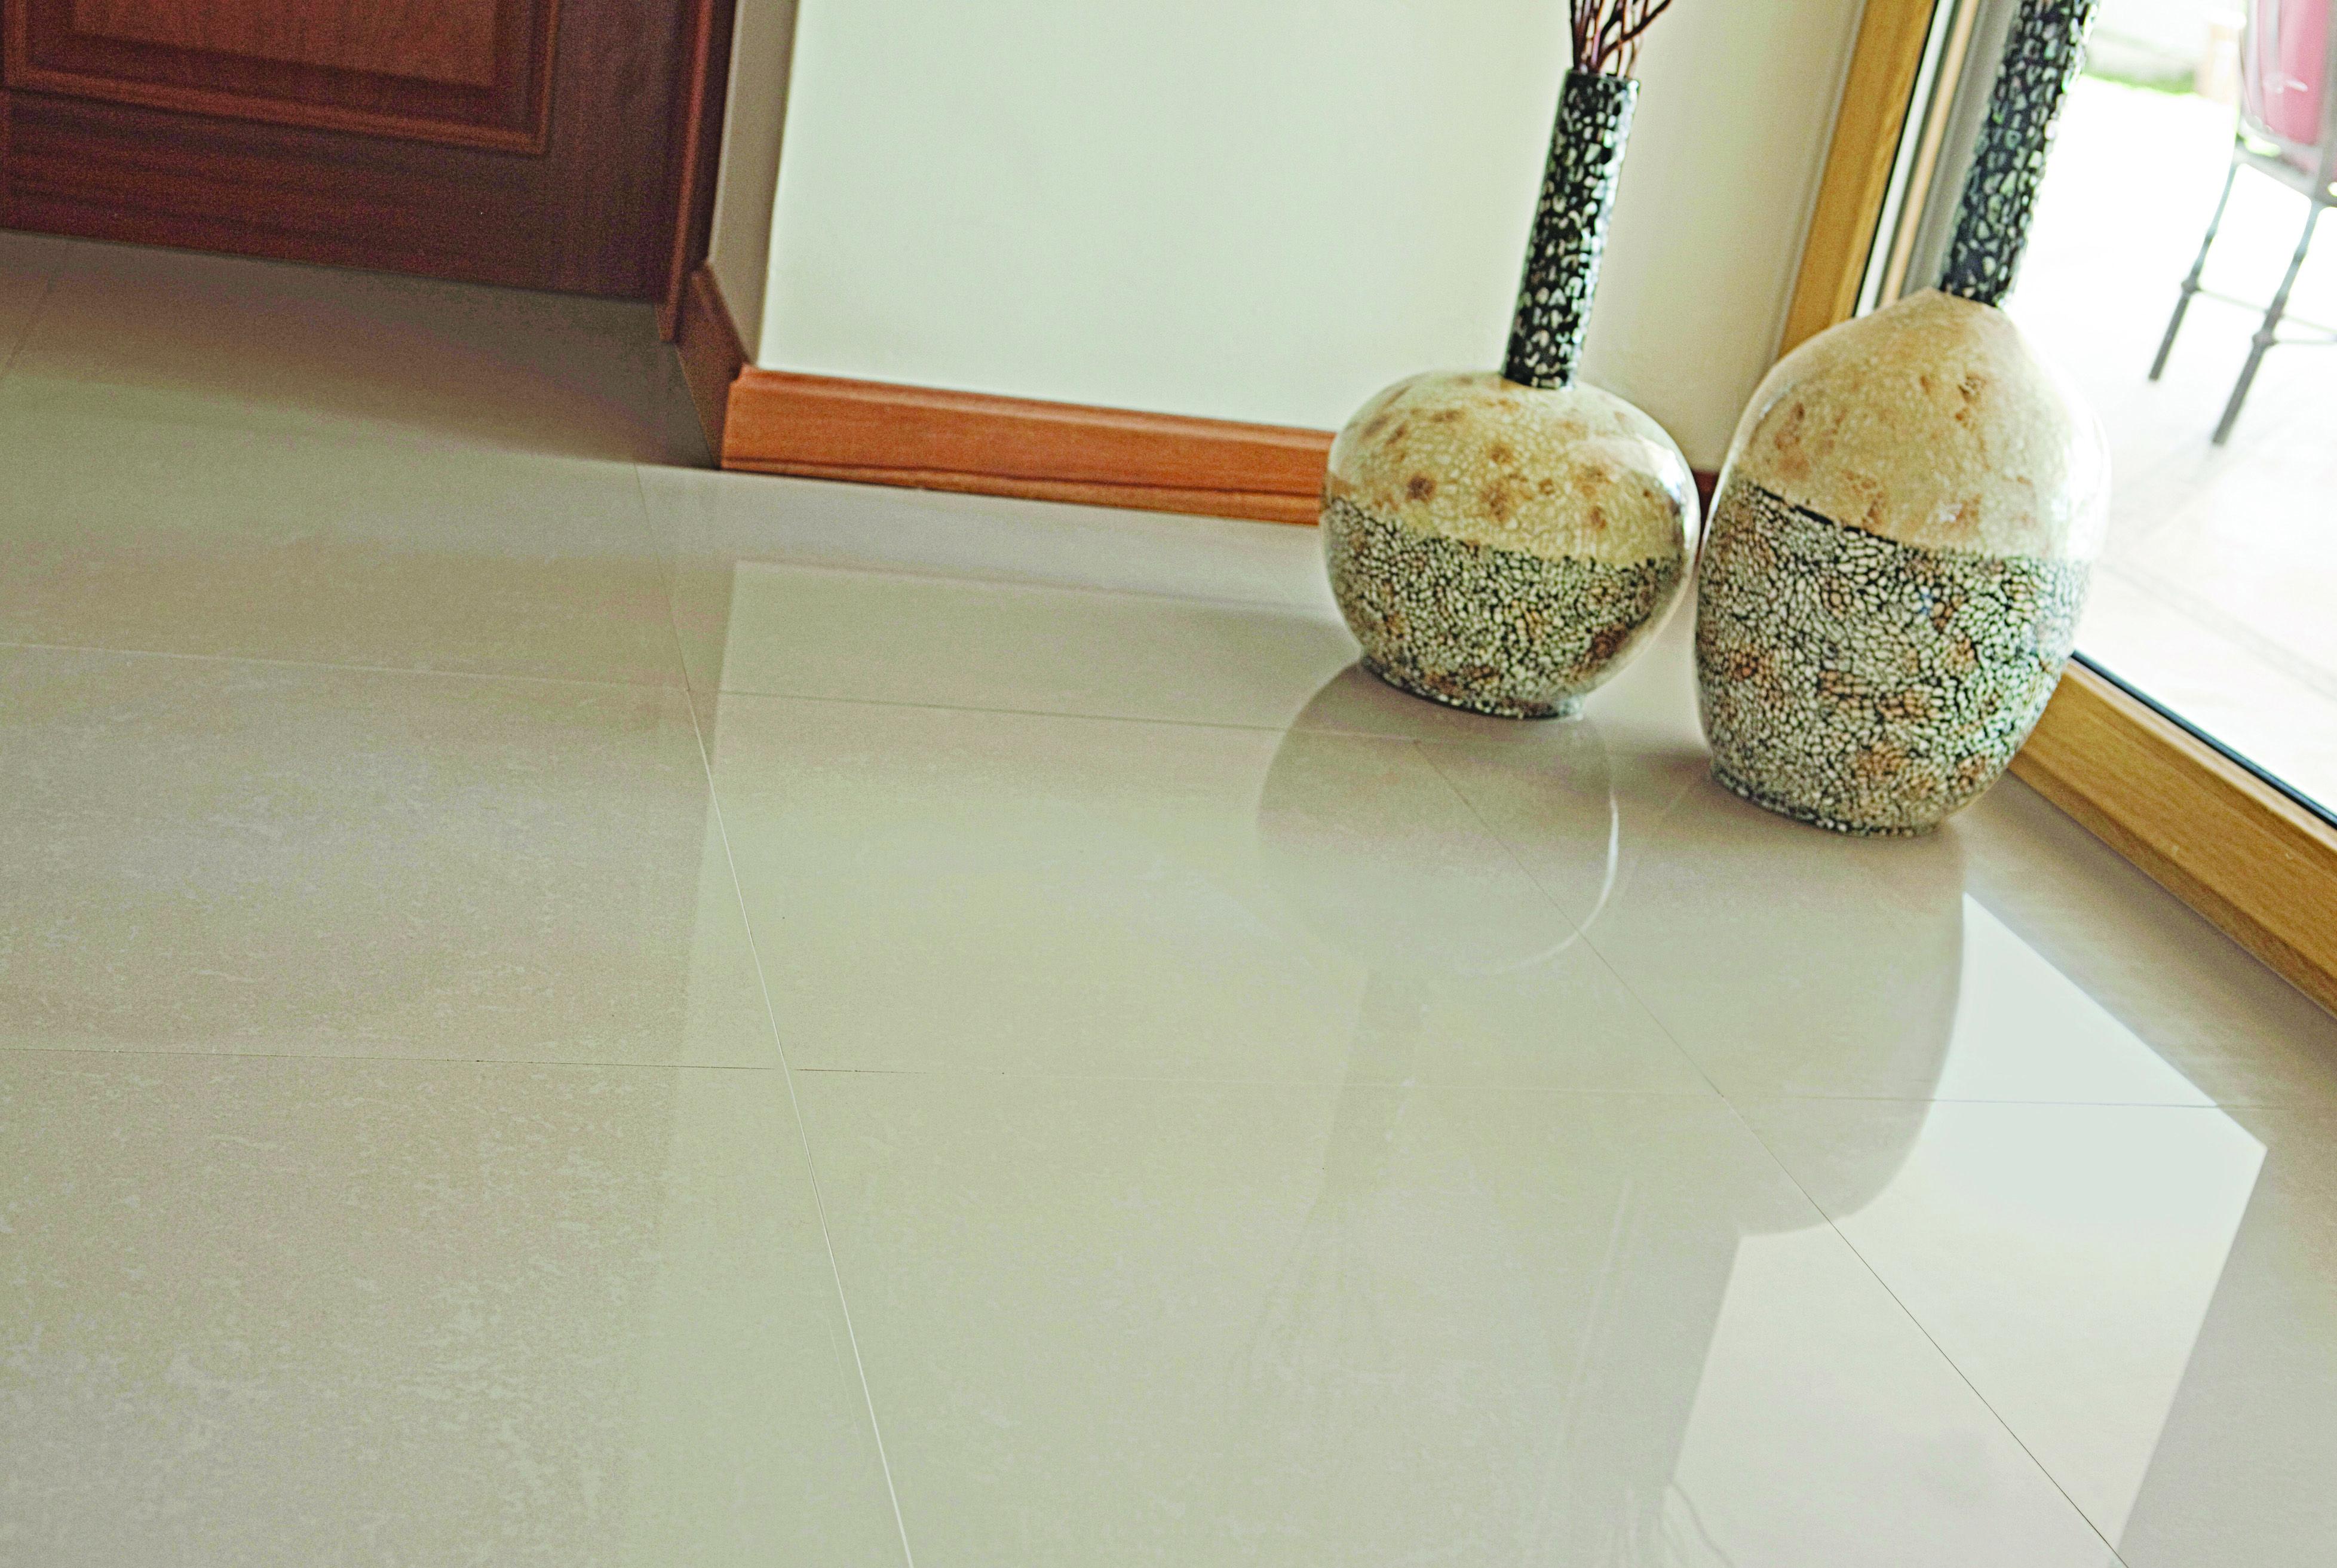 Piso porcelanato lisboa elegancia a tus pies pisos - Decoracion pisos modernos ...